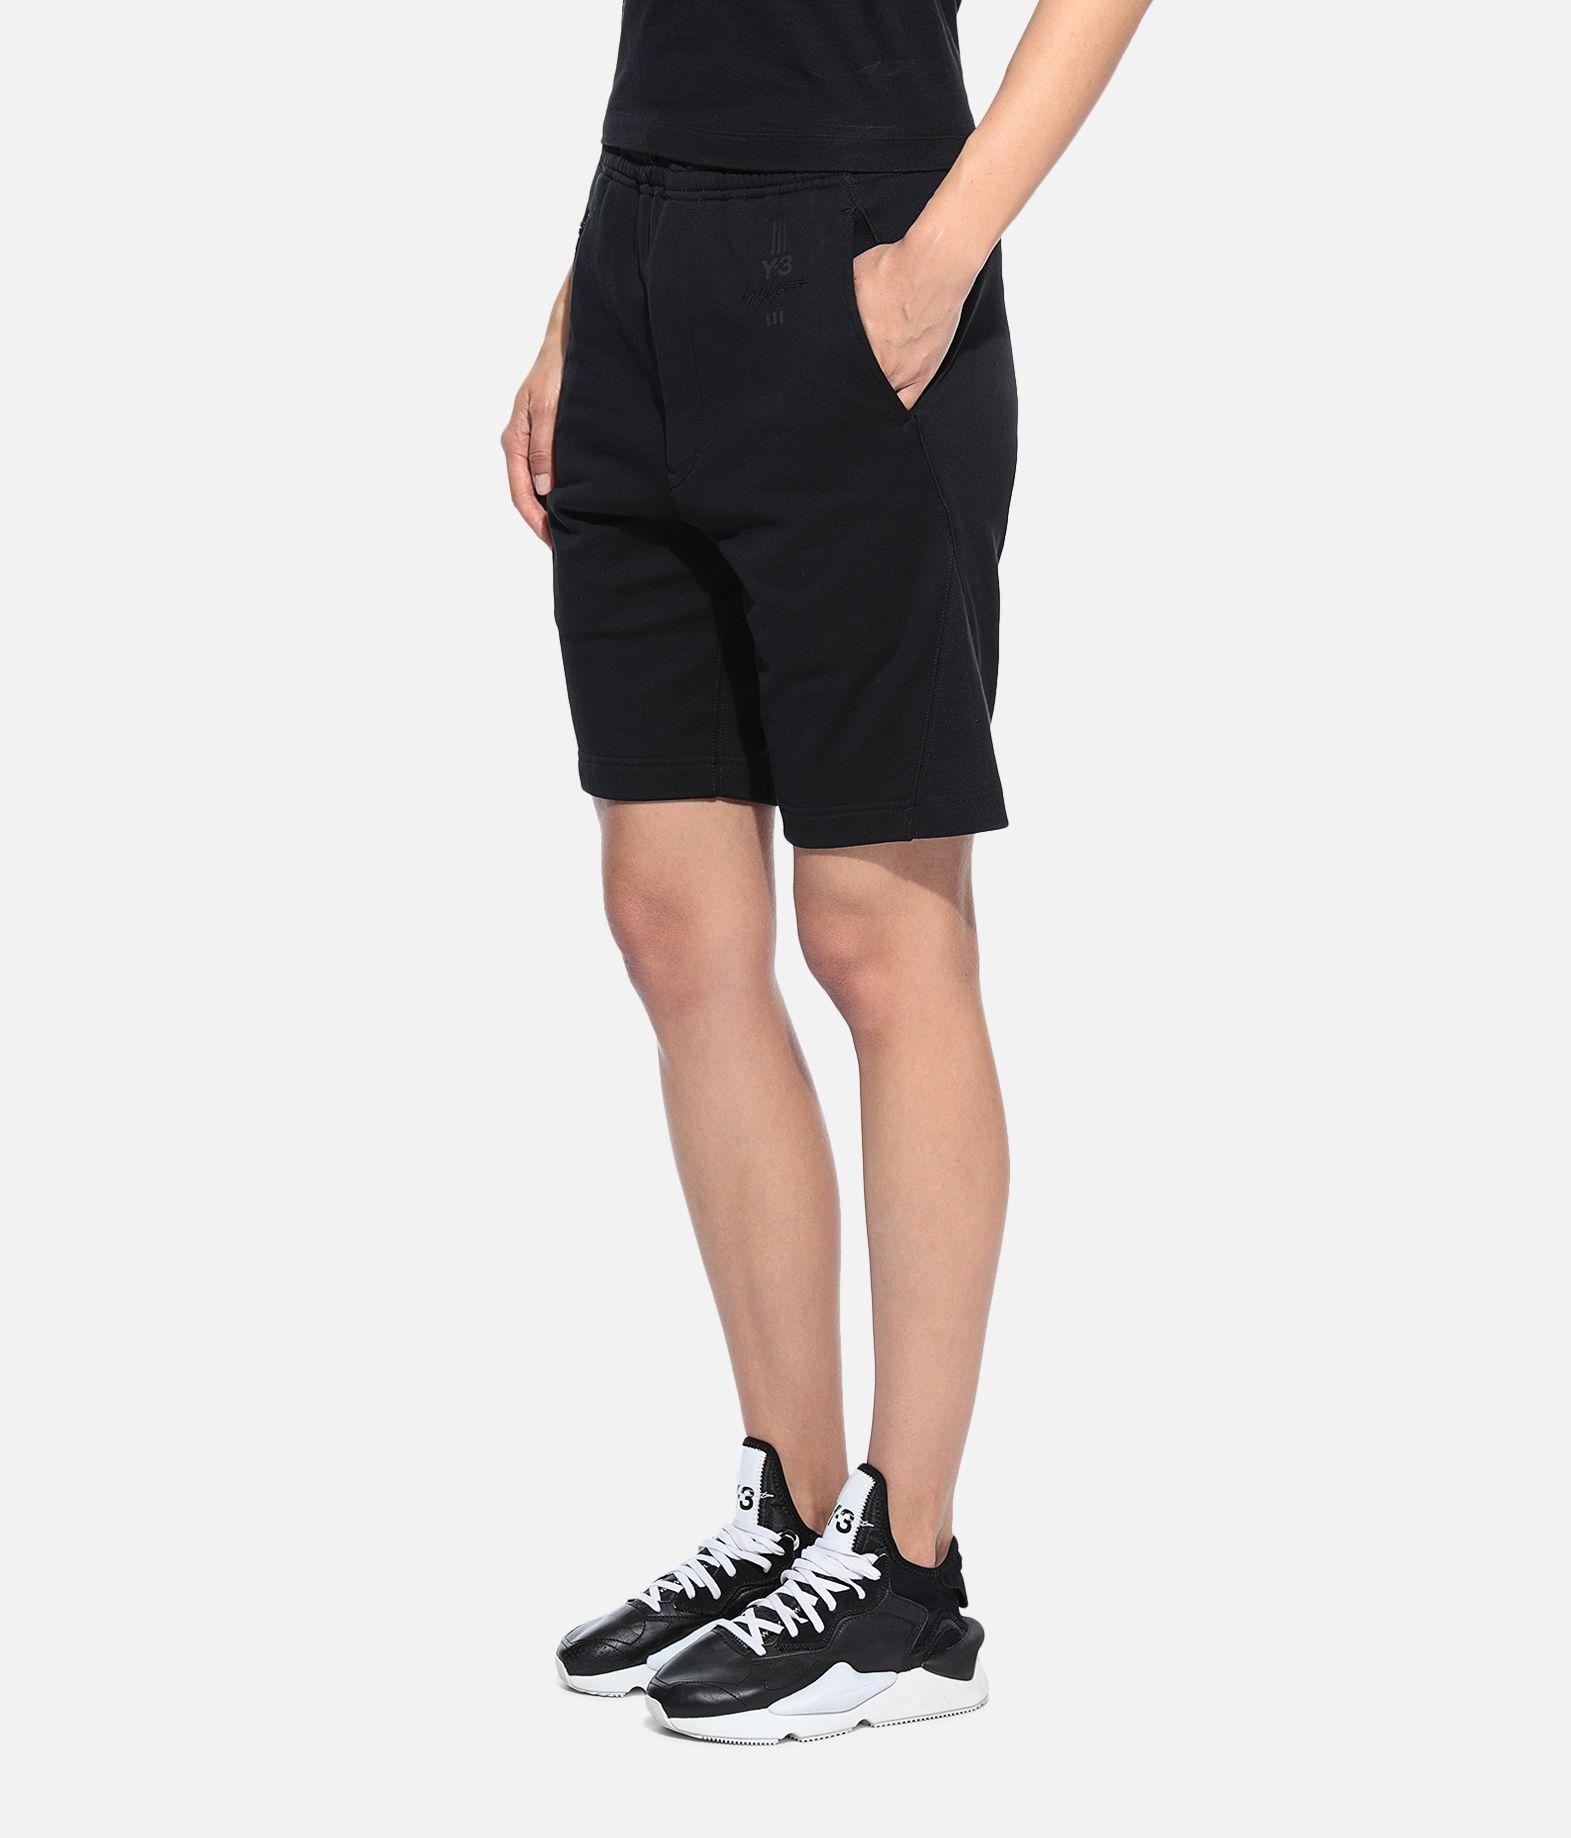 Y-3 Y-3 Classic Shorts Shorts Woman e